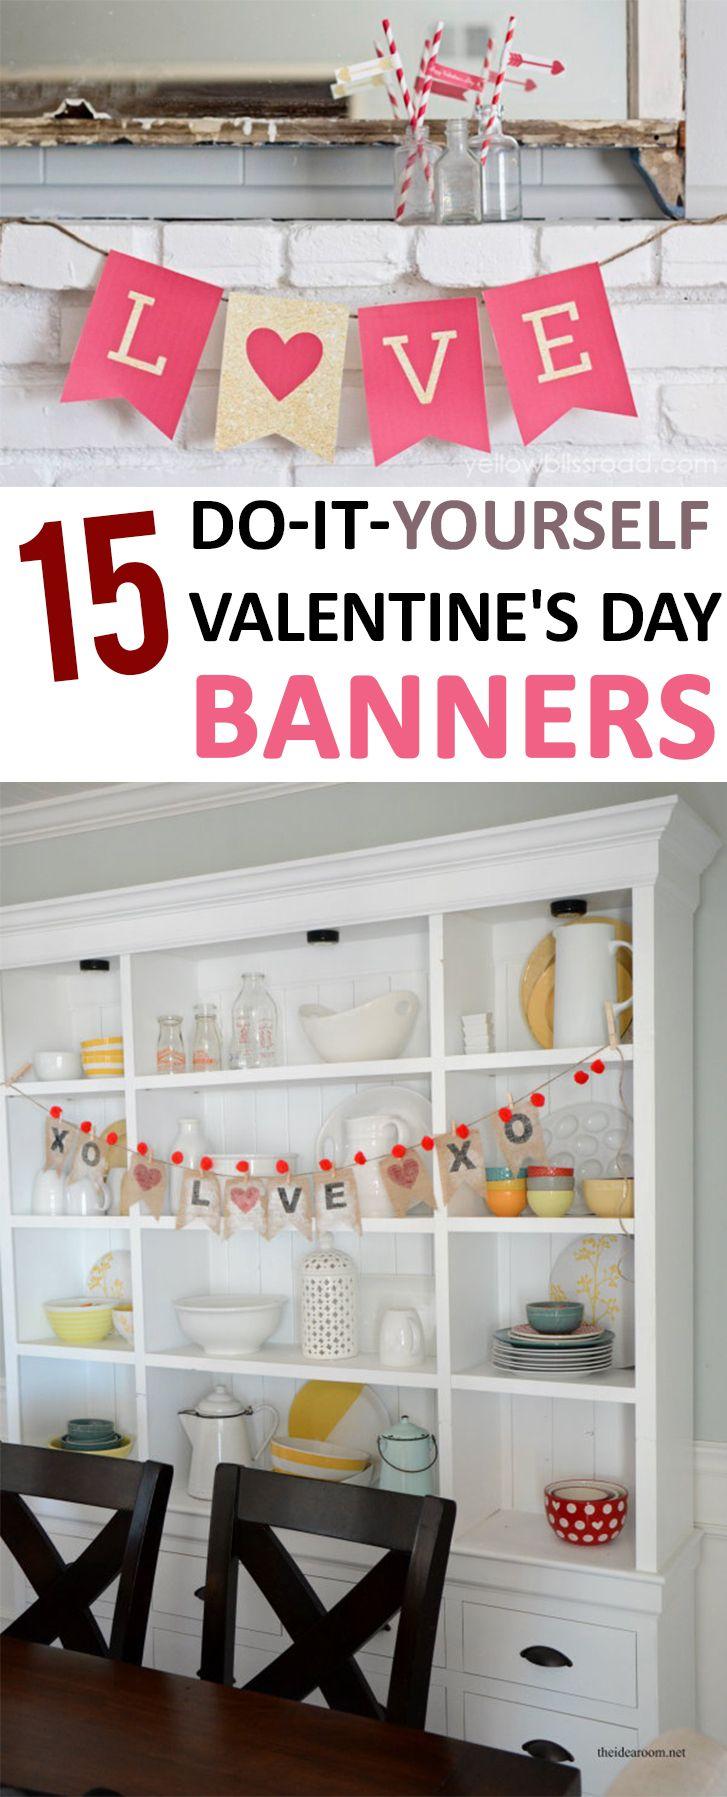 Valentines Day, Homemade Valentines Day Decorations, Valentines Day DIY, Holiday Decor Ideas, Holiday Decor Help, Valentines Day Banners, Valentines Day Mantle, Popular